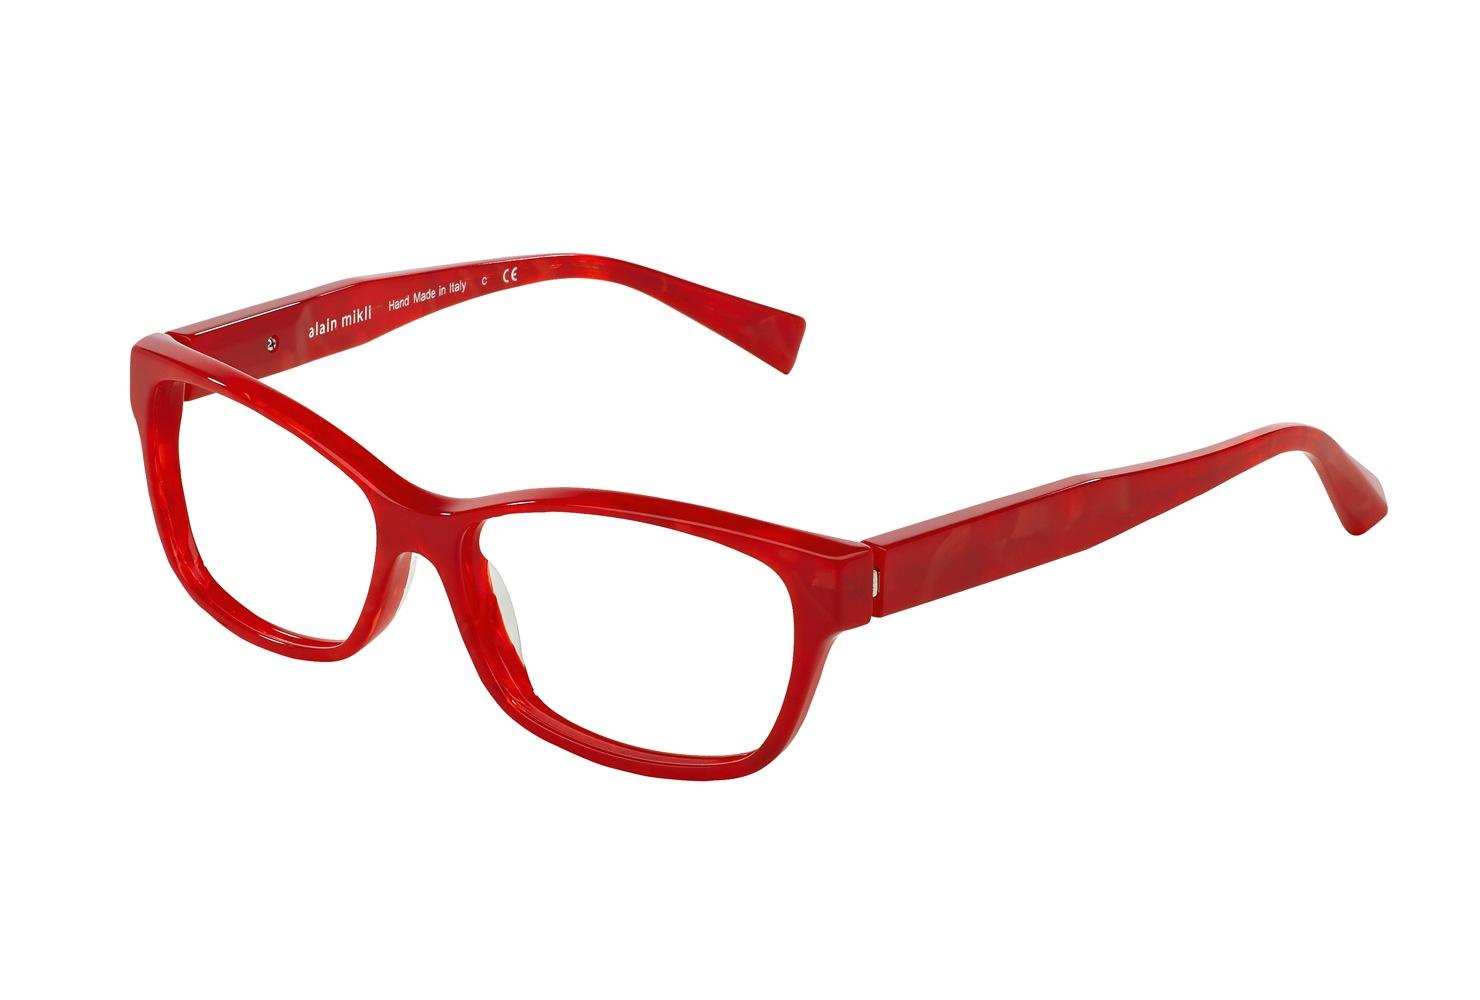 Alain Mikli Designer Eyewear A03023 Eyeglasses